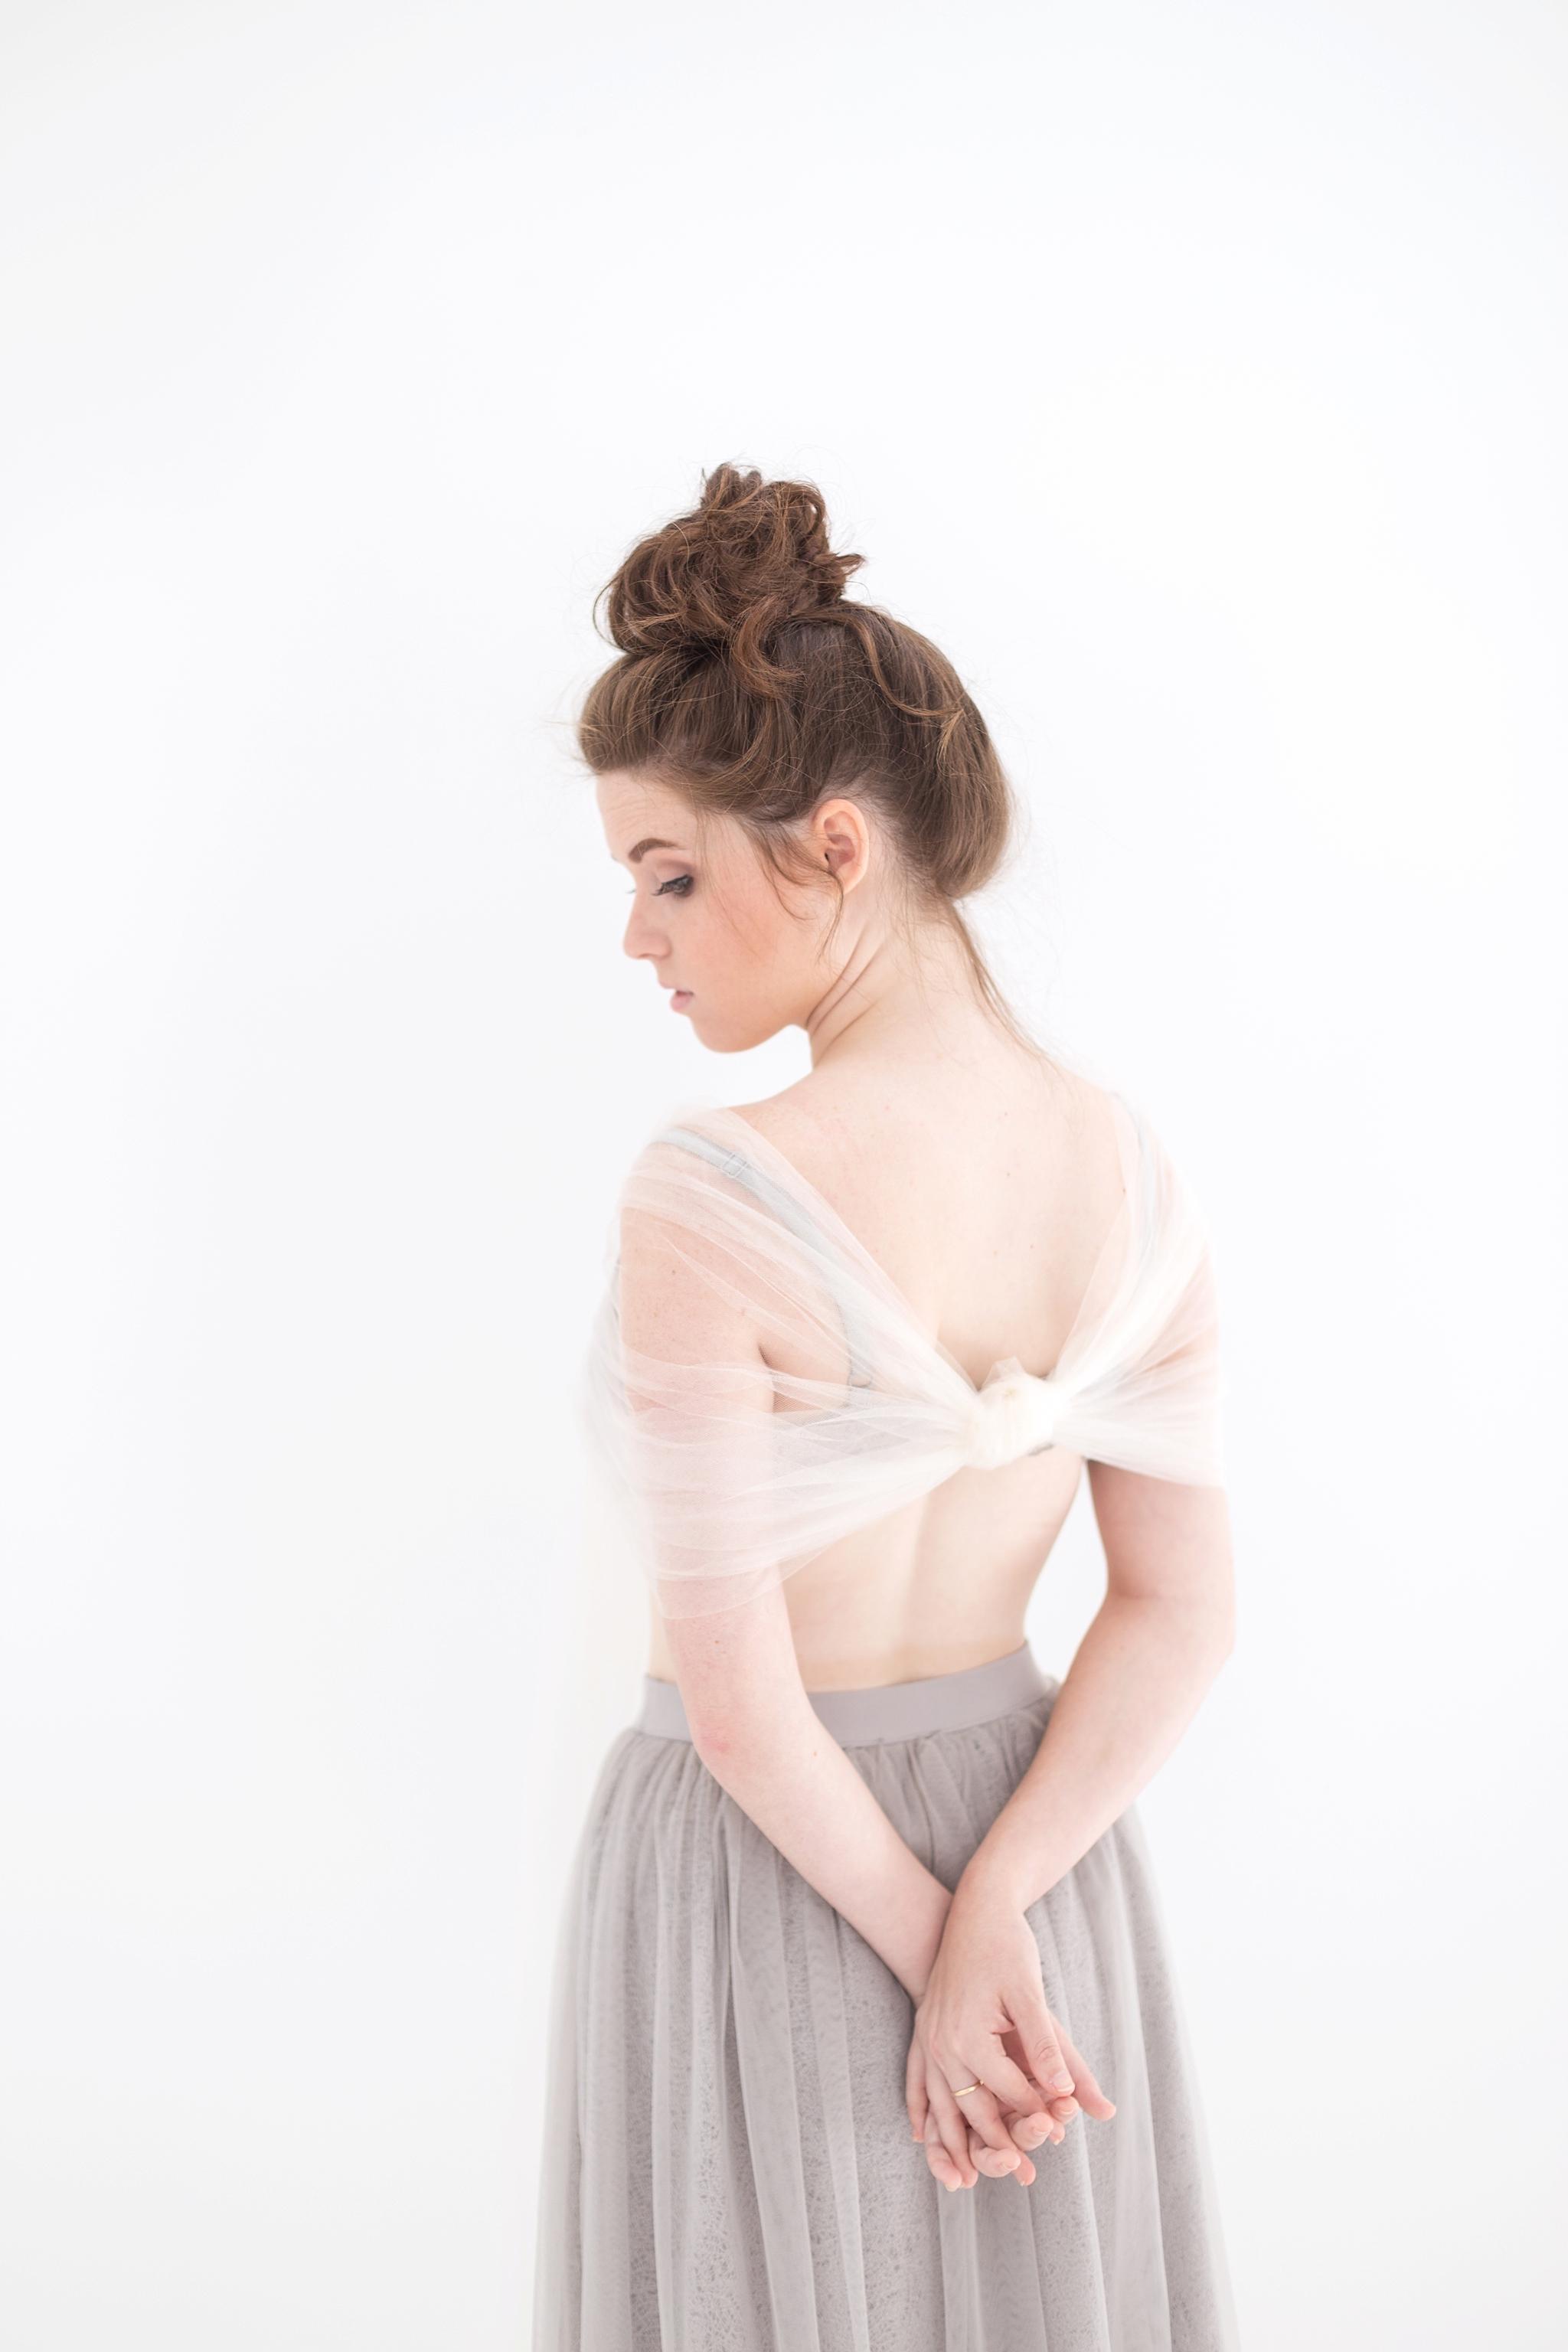 Amber-Nicole-Photography-Momni-fashion_0013.jpg